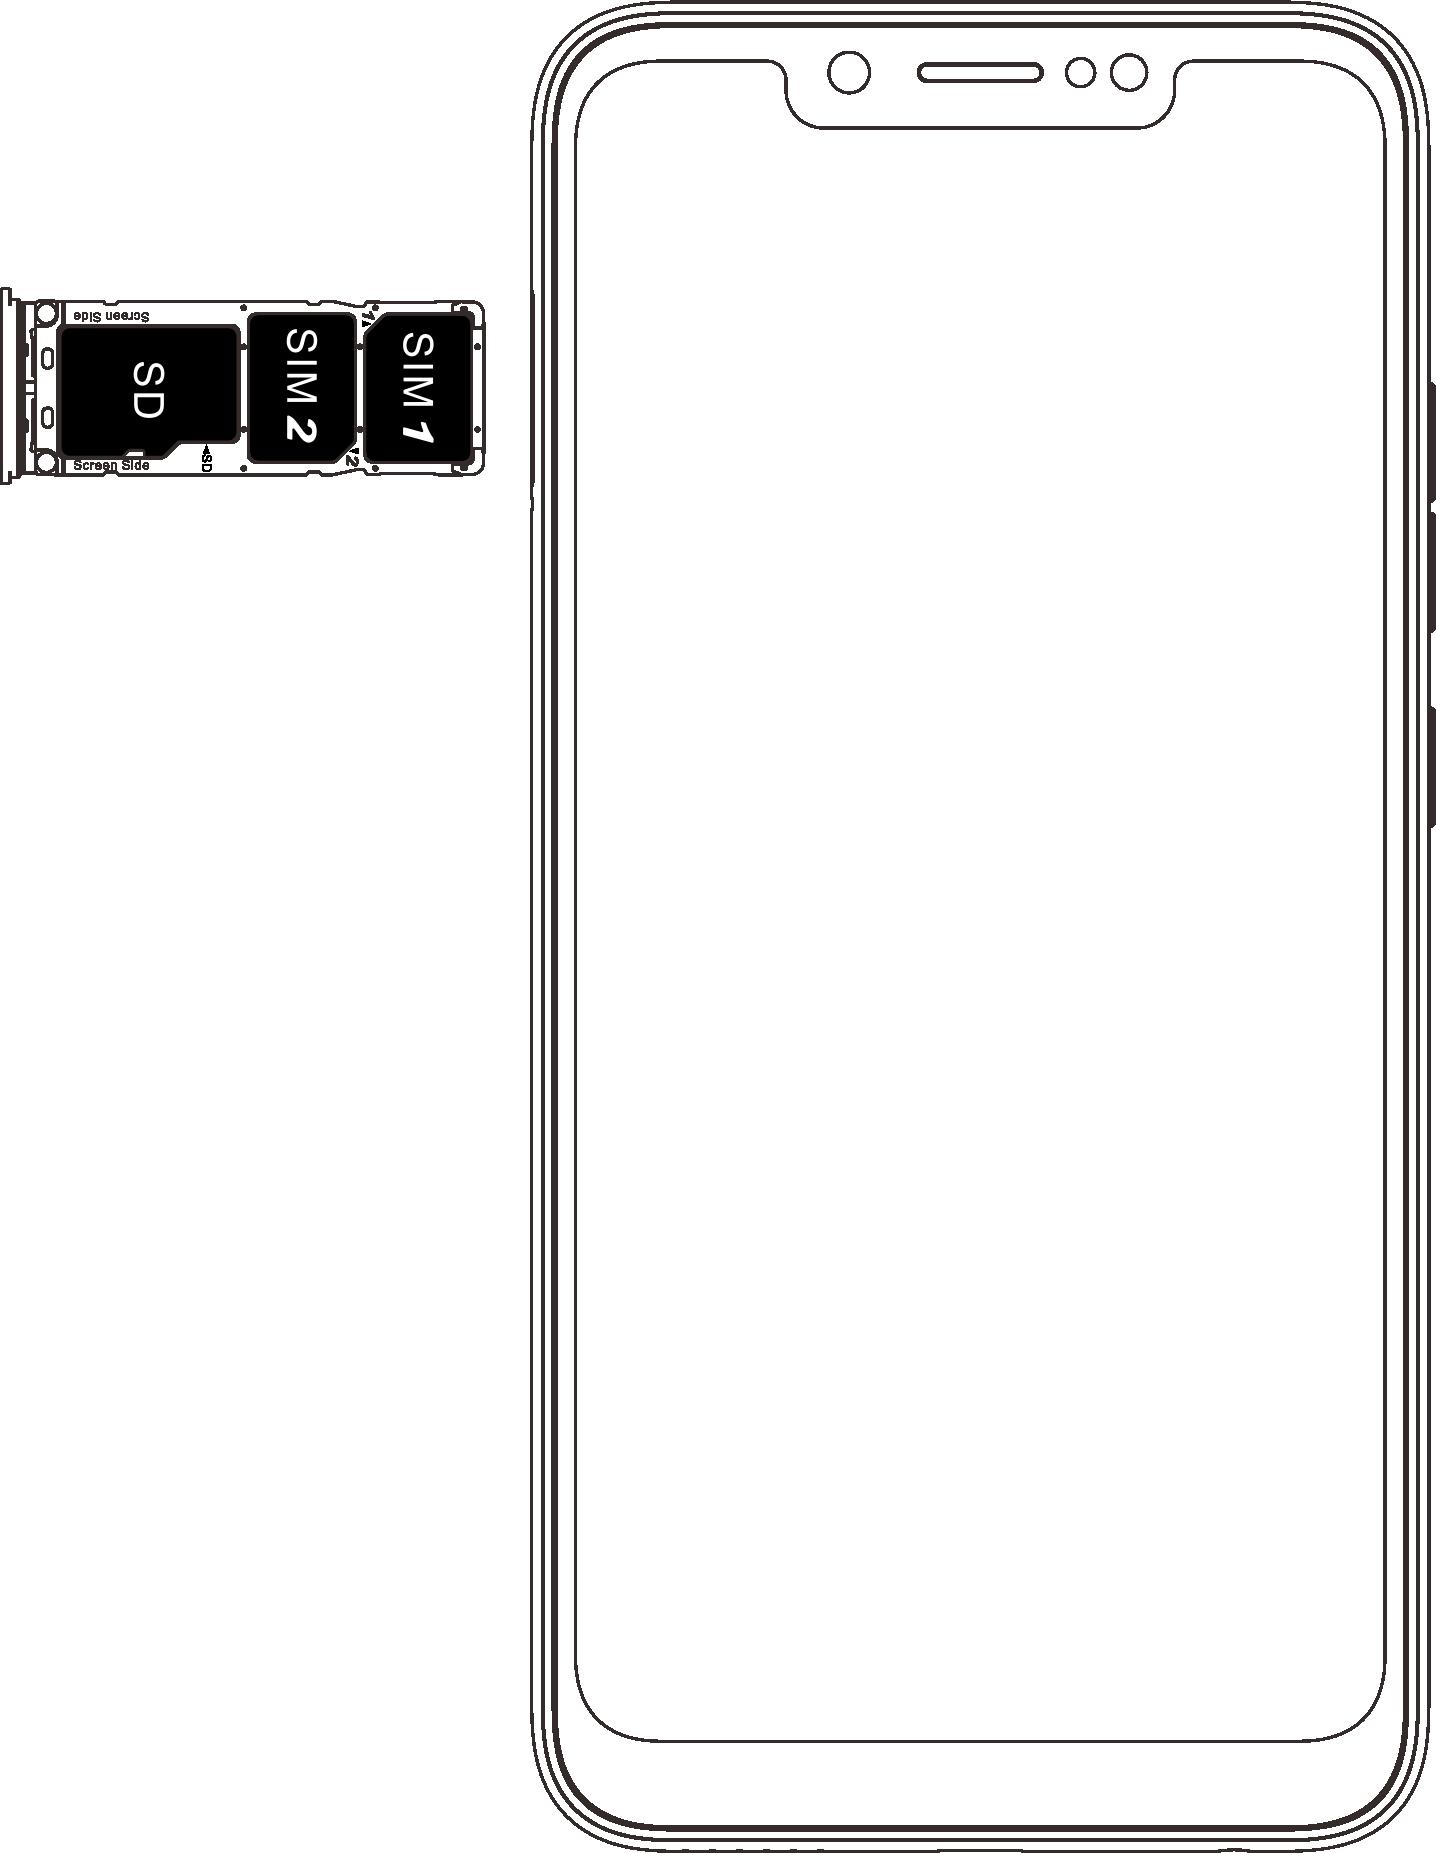 tecno camon 11 pro Tecno Camon 11 Pro CF8 chaka V3